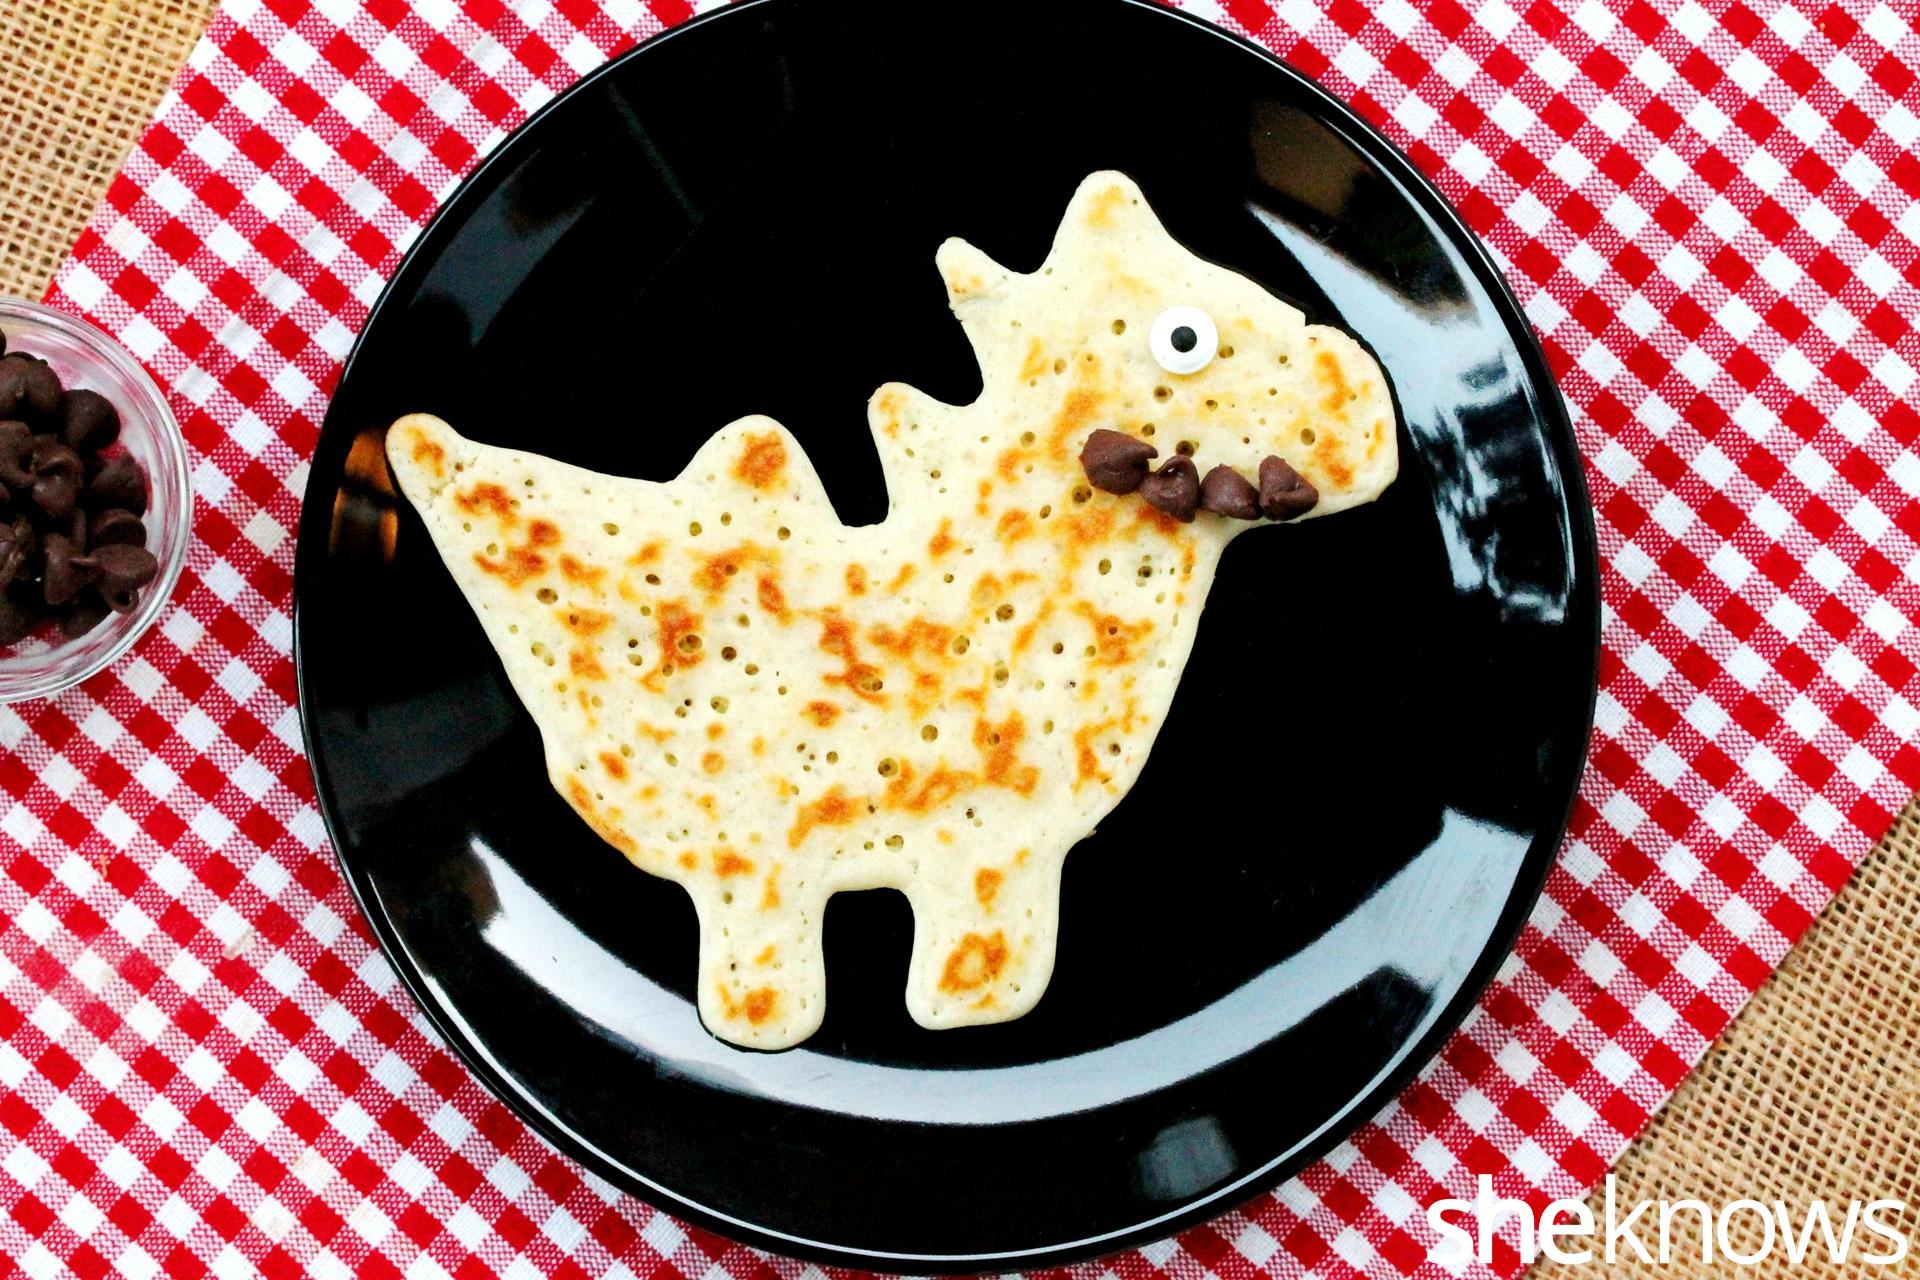 dinosaur-pancake-with-teeth